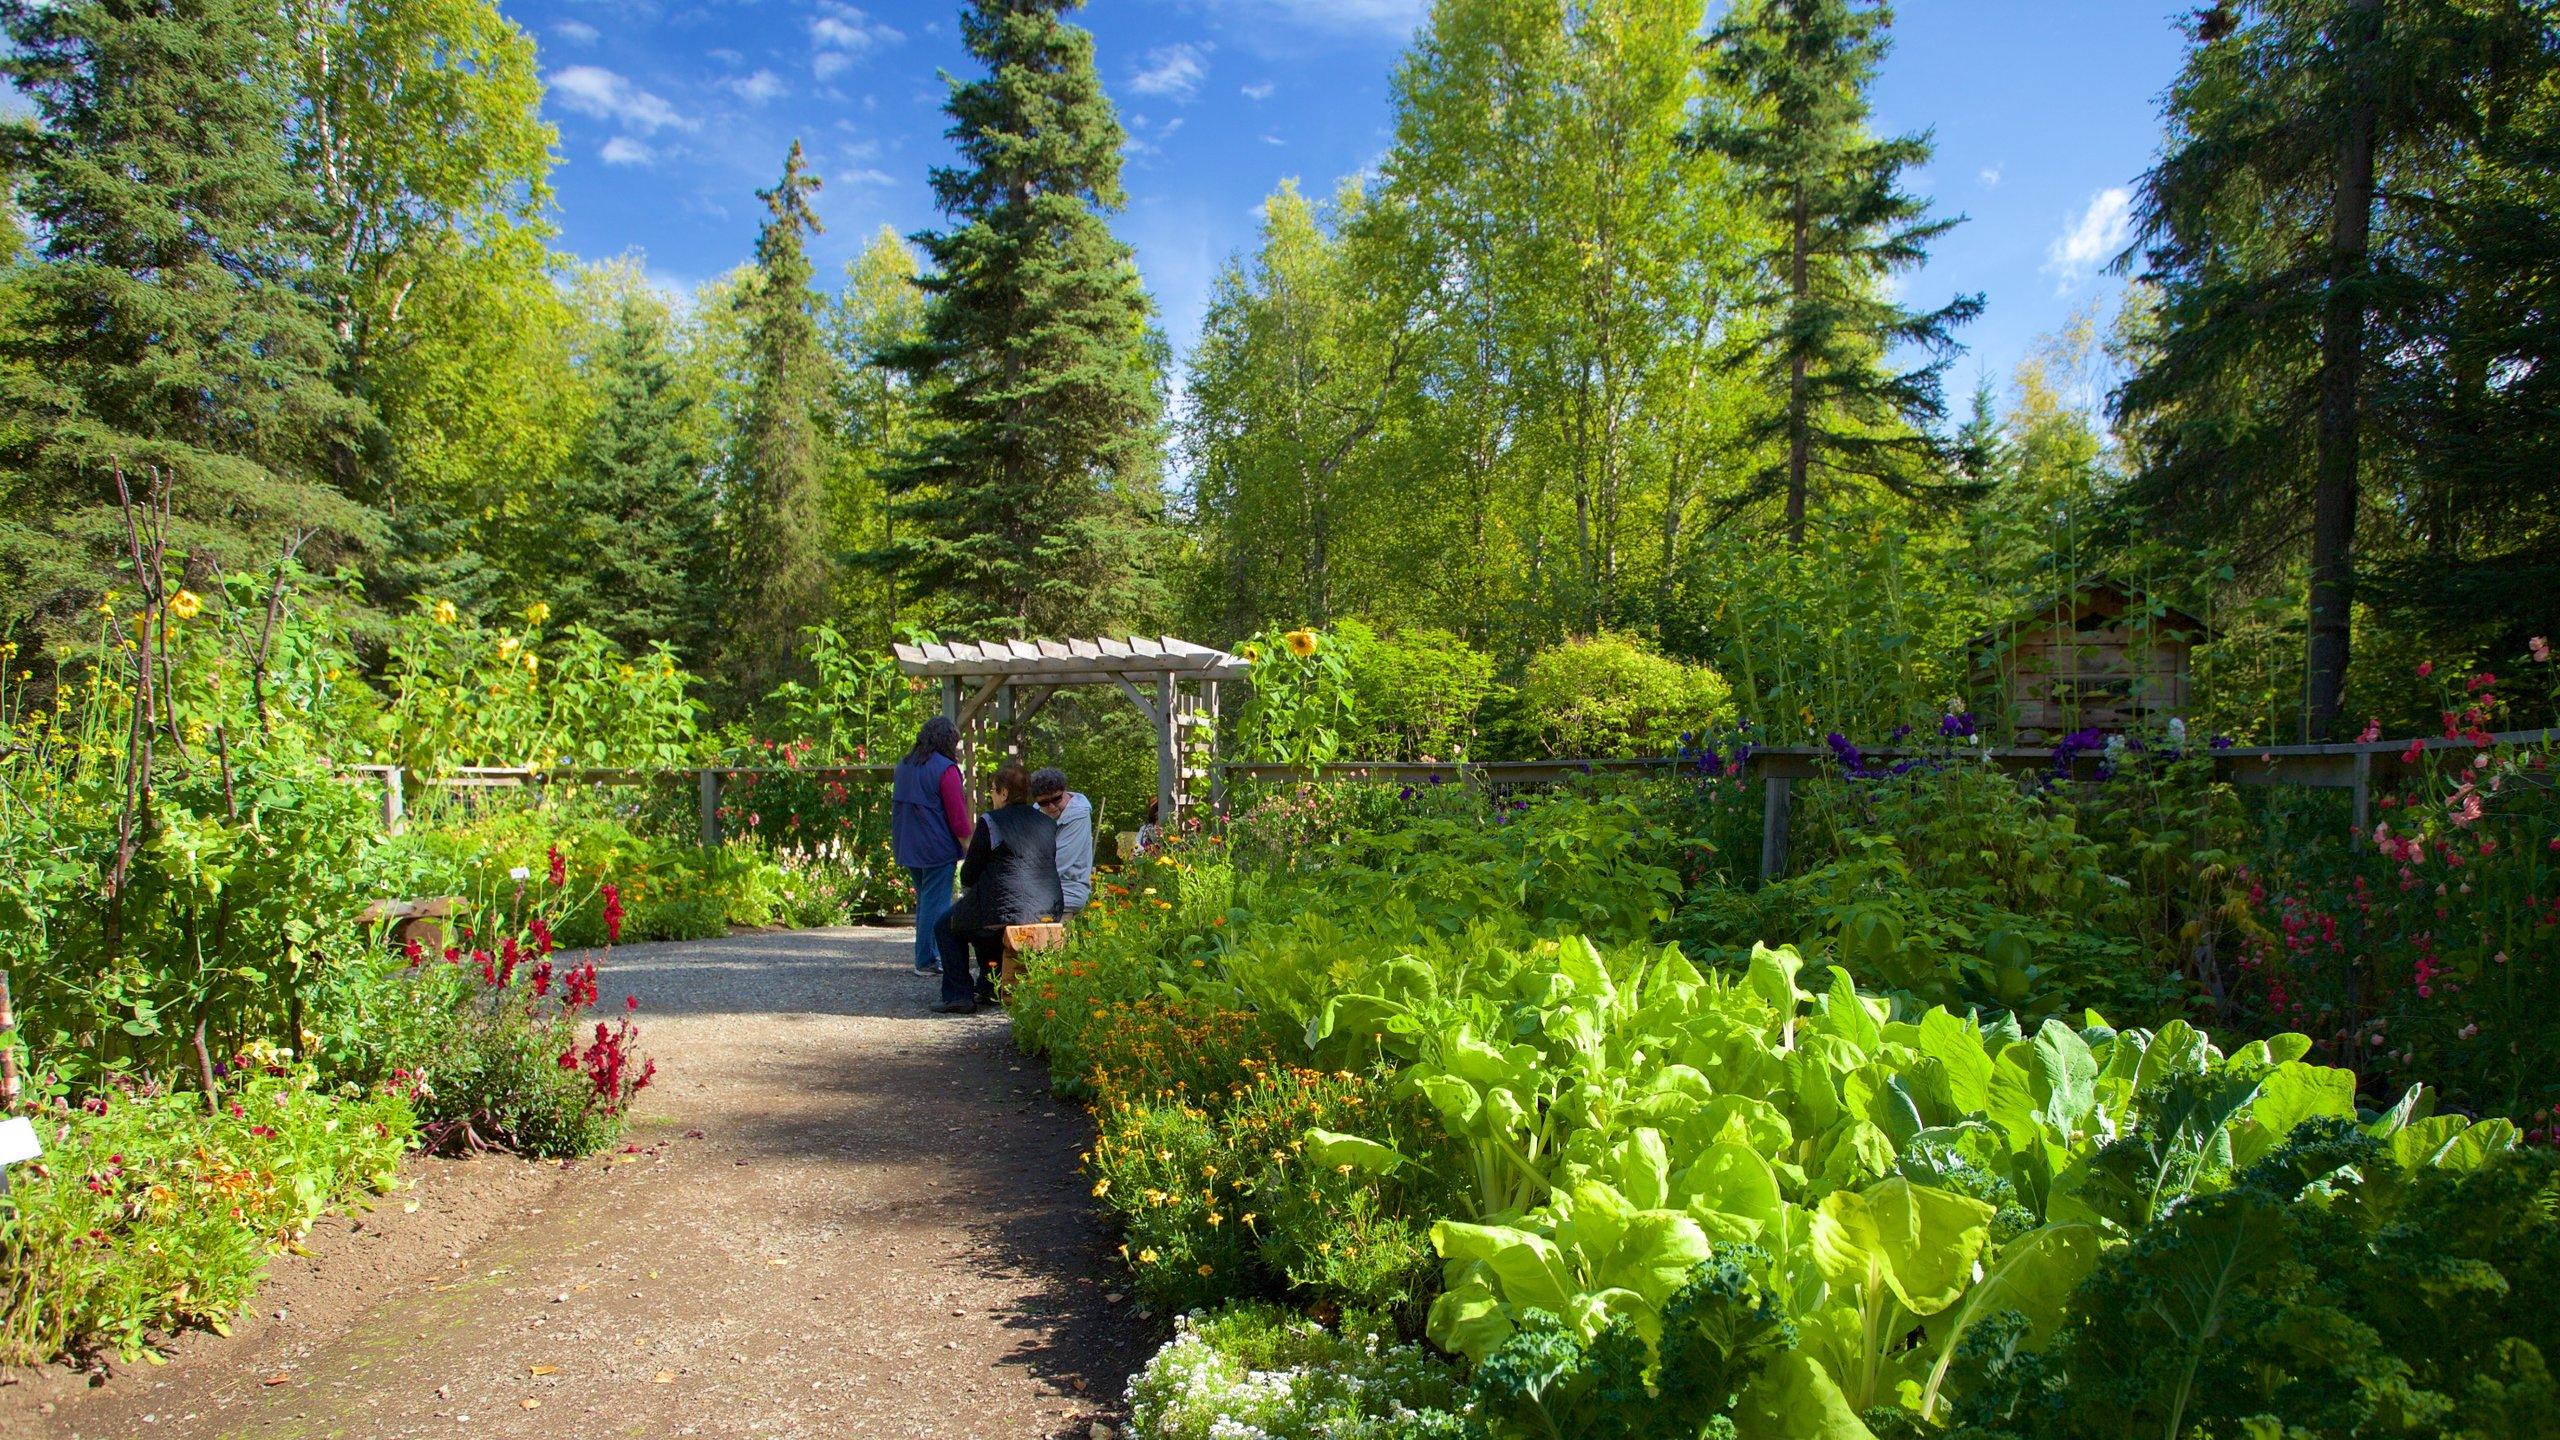 Alaska Botanical Garden, Anchorage, Alaska, United States of America